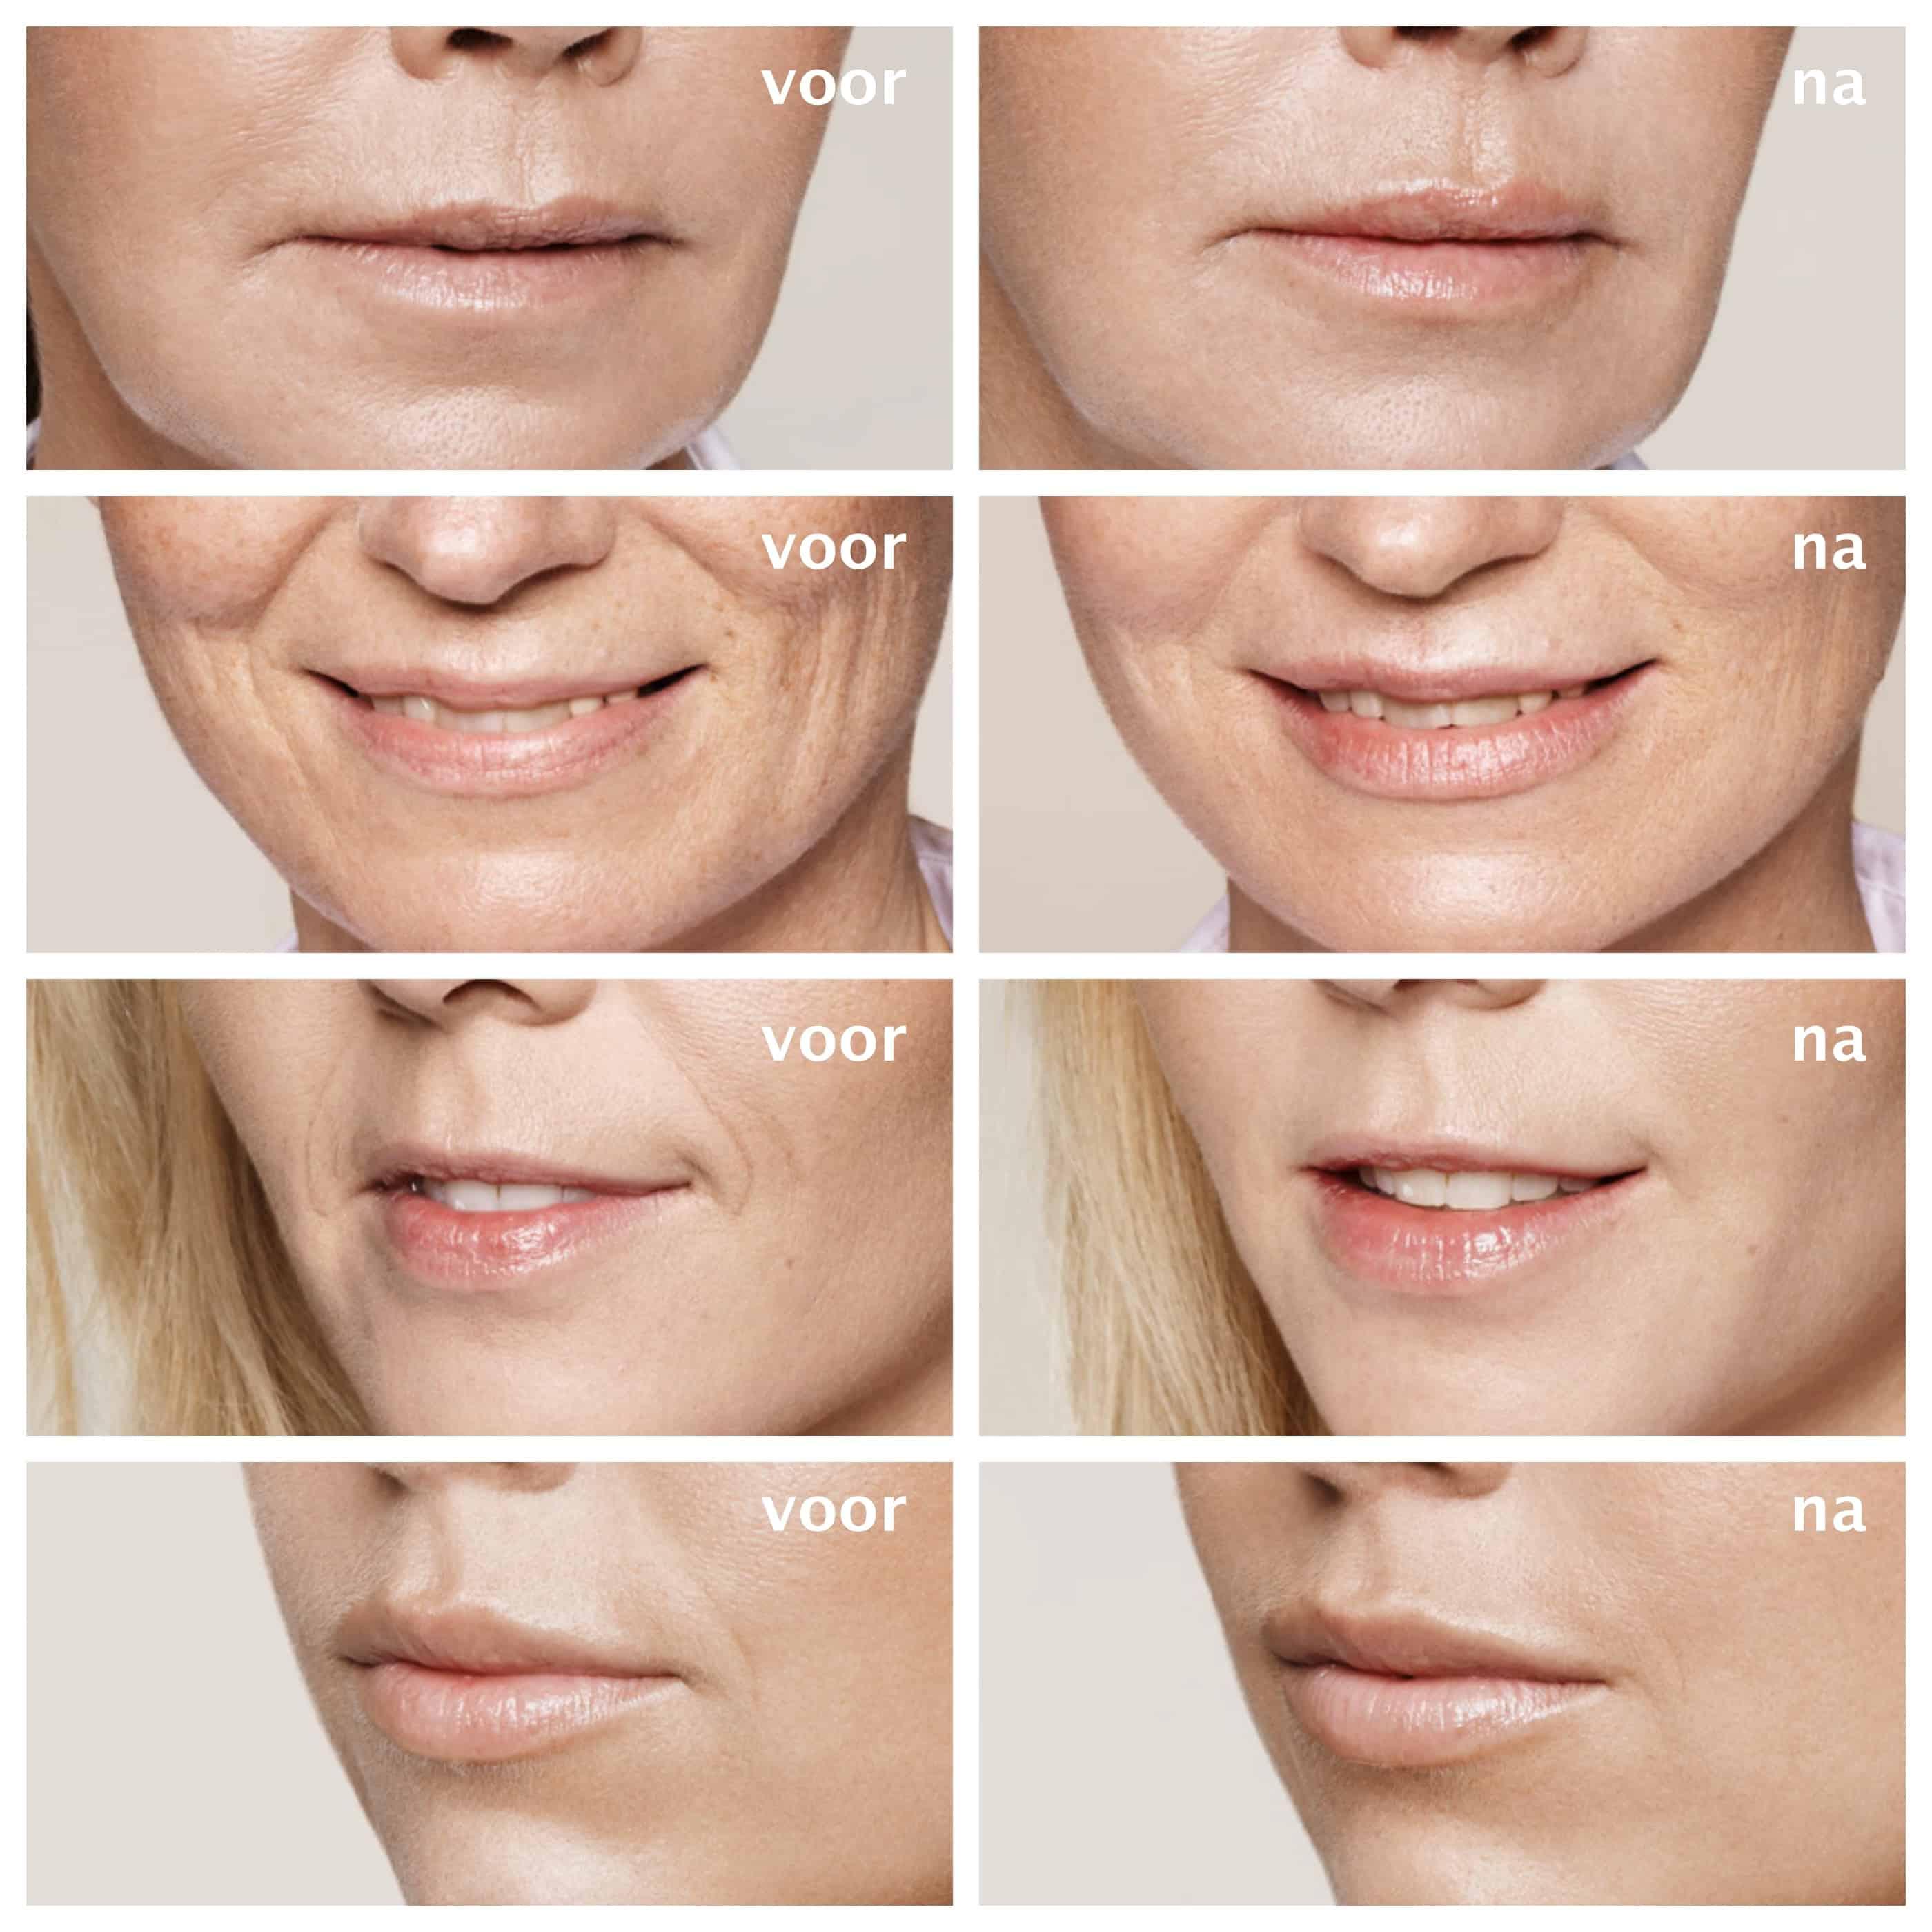 YourFace - lippen opvullen